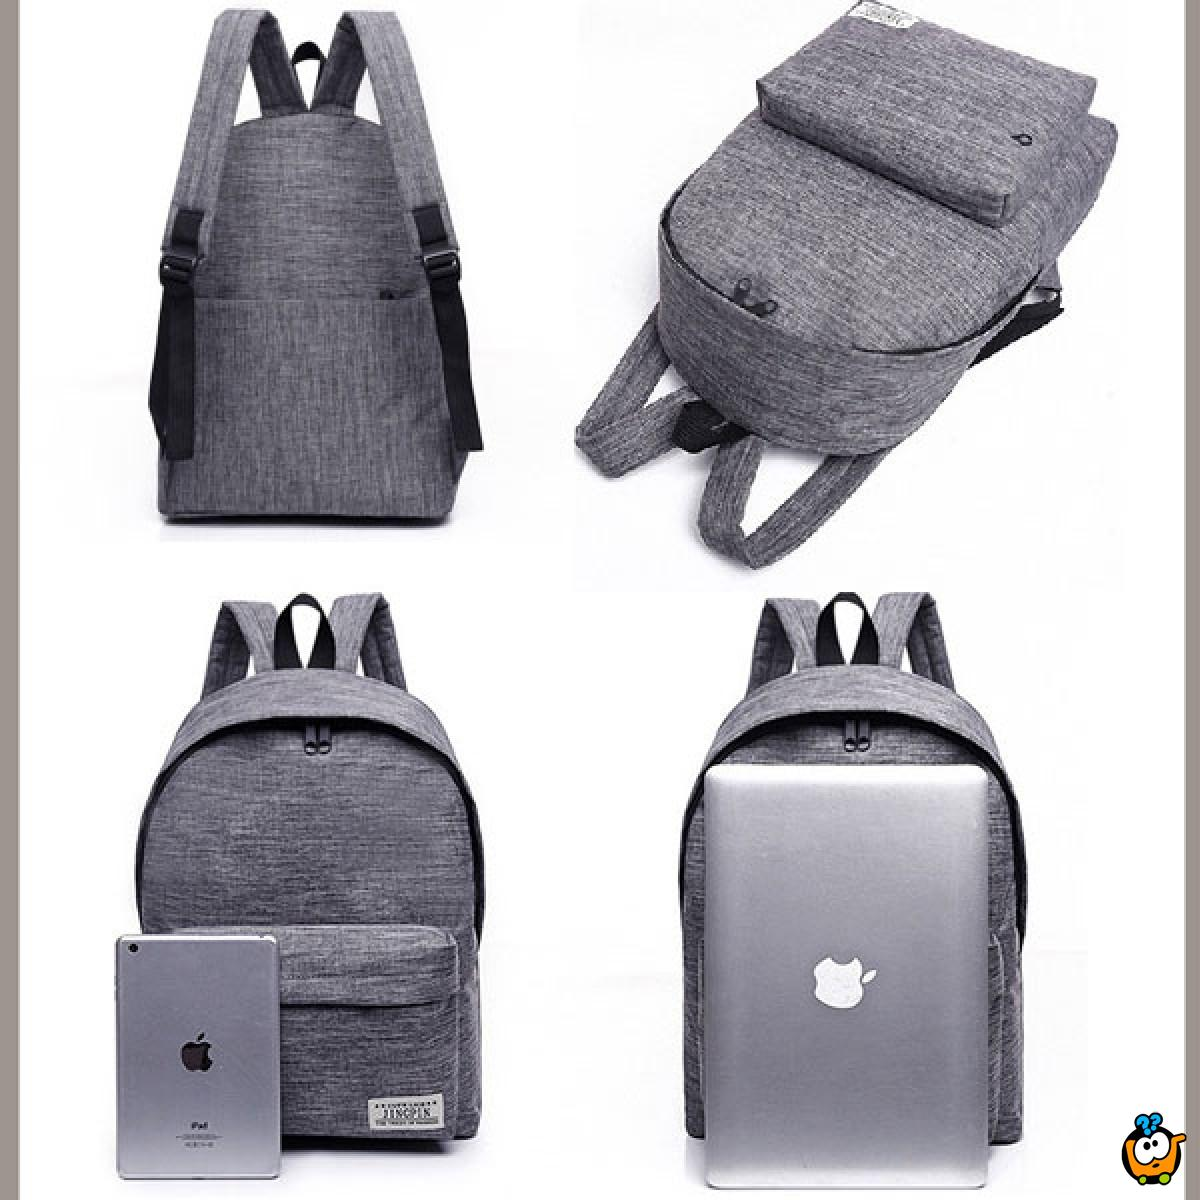 Muški ranac - Inspiration travel backpack